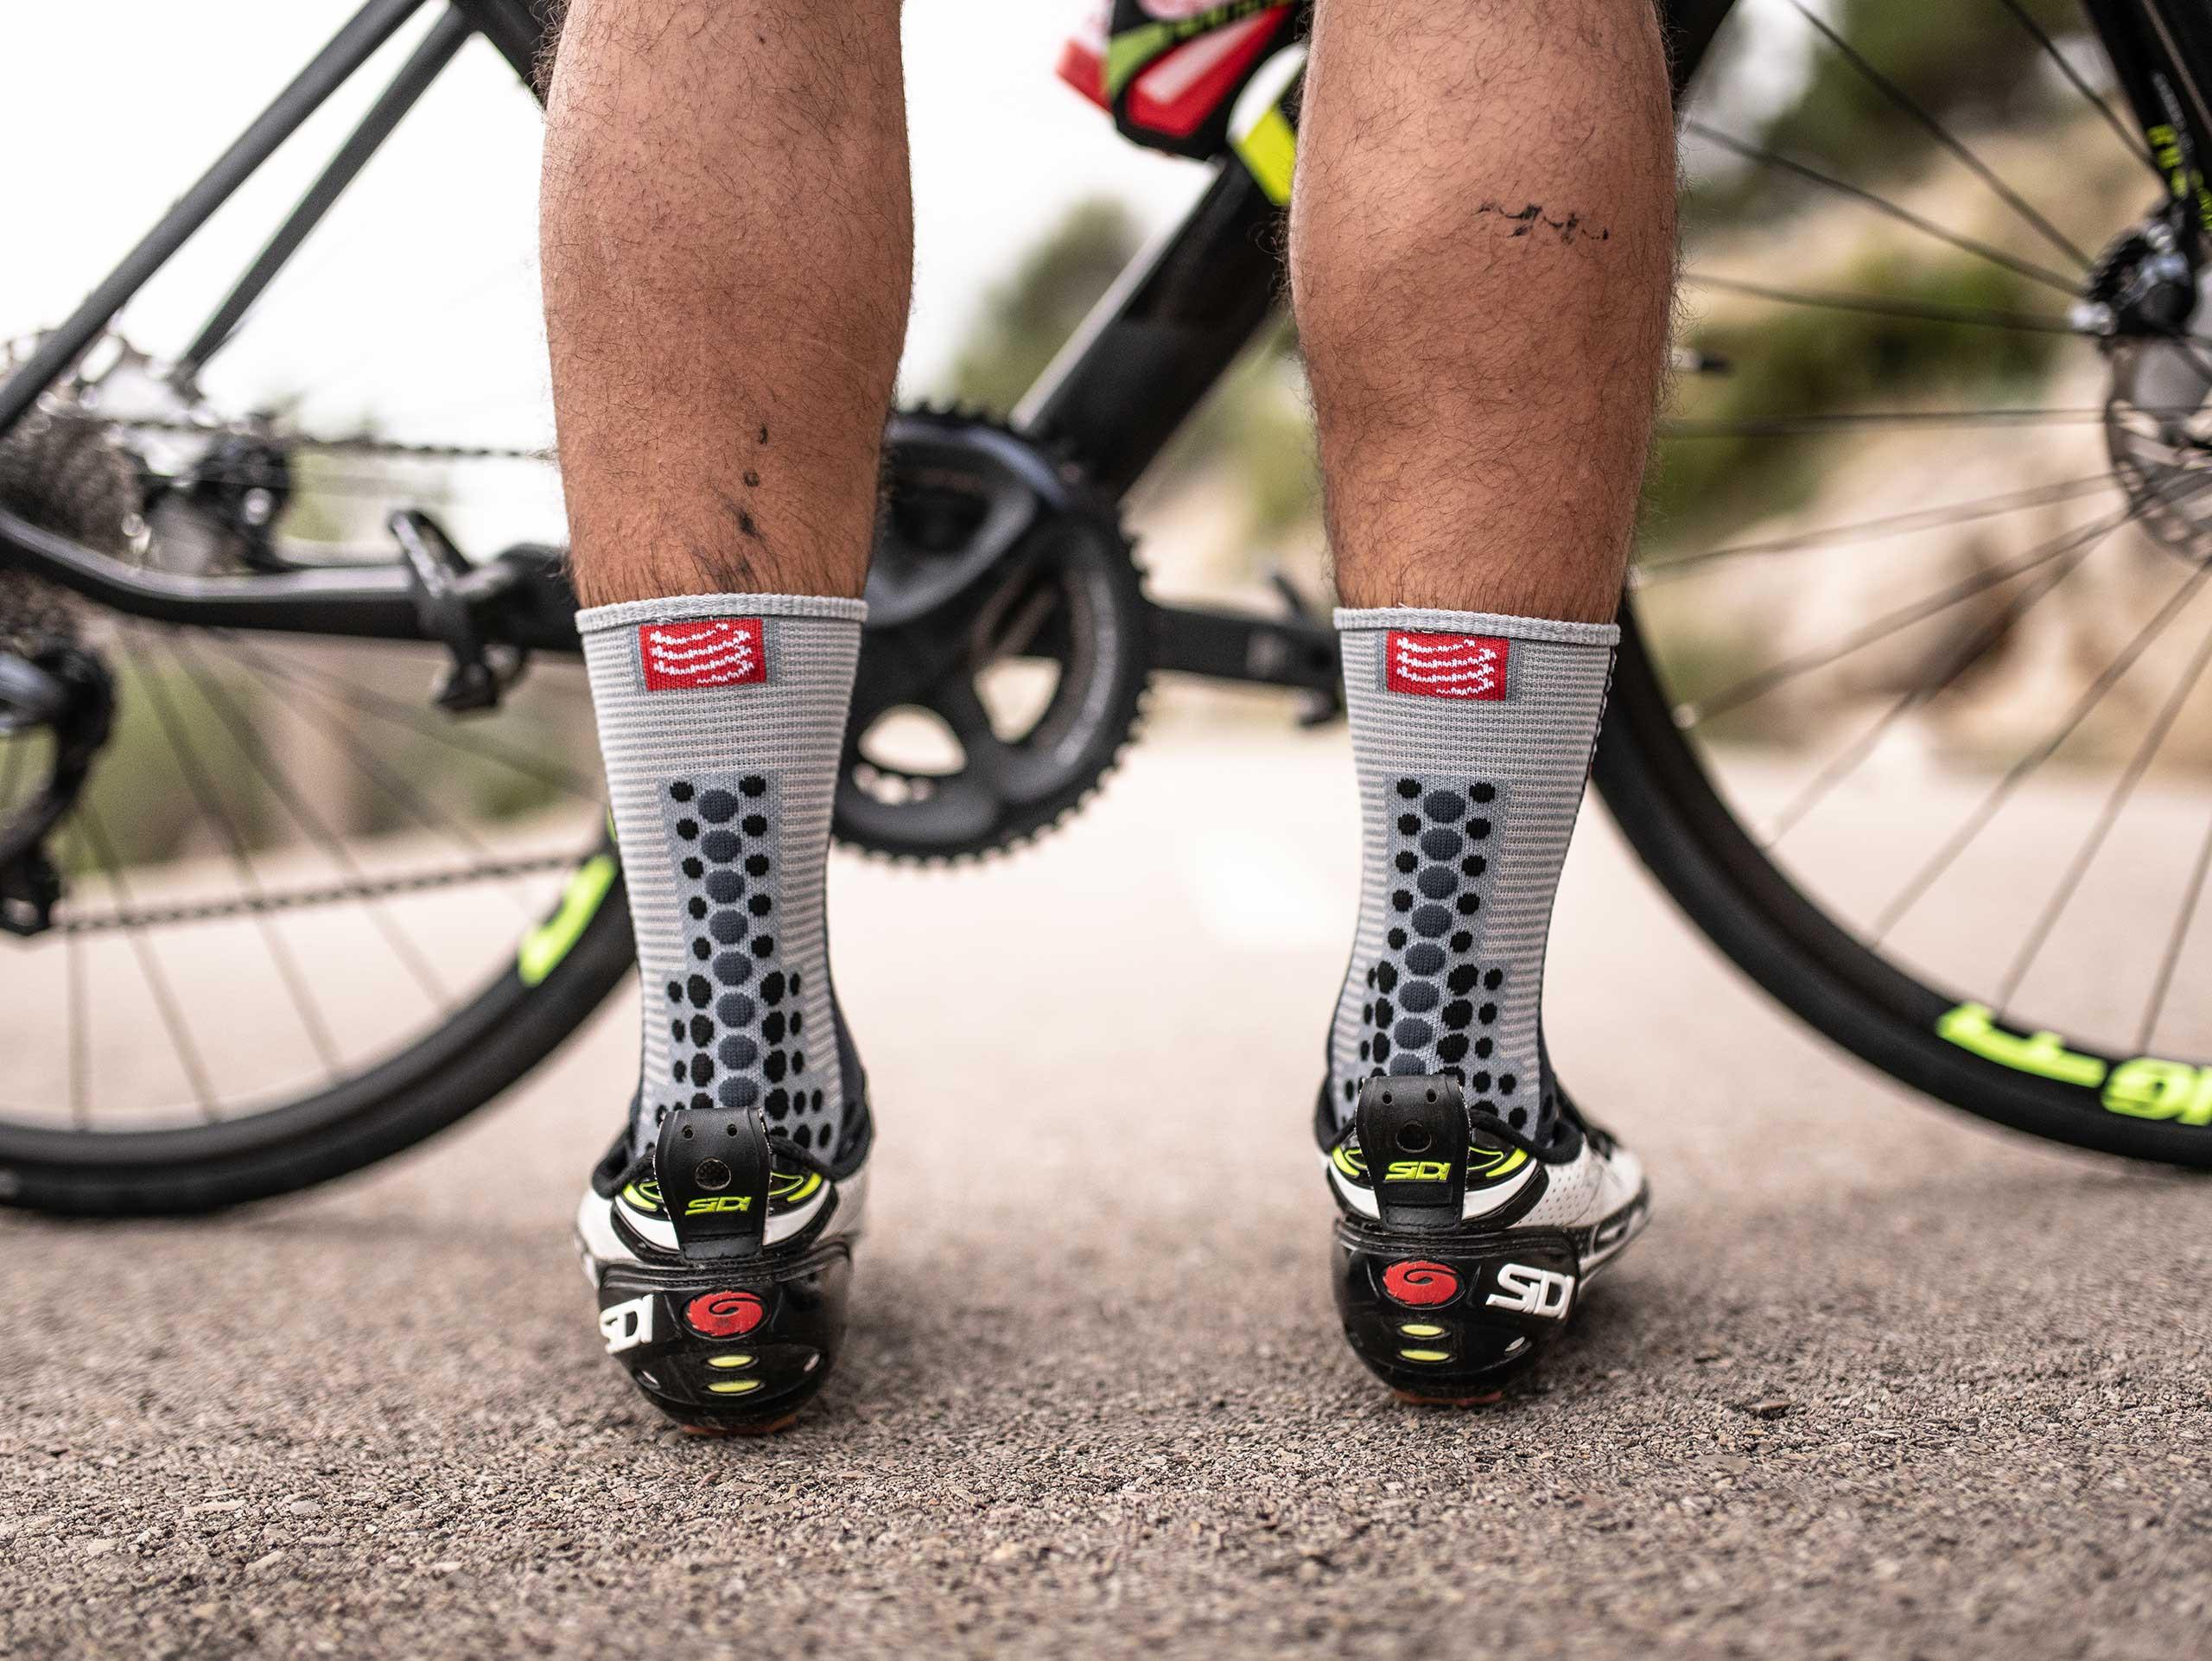 Pro Racing Socks v3.0 Bike - Grau-meliert